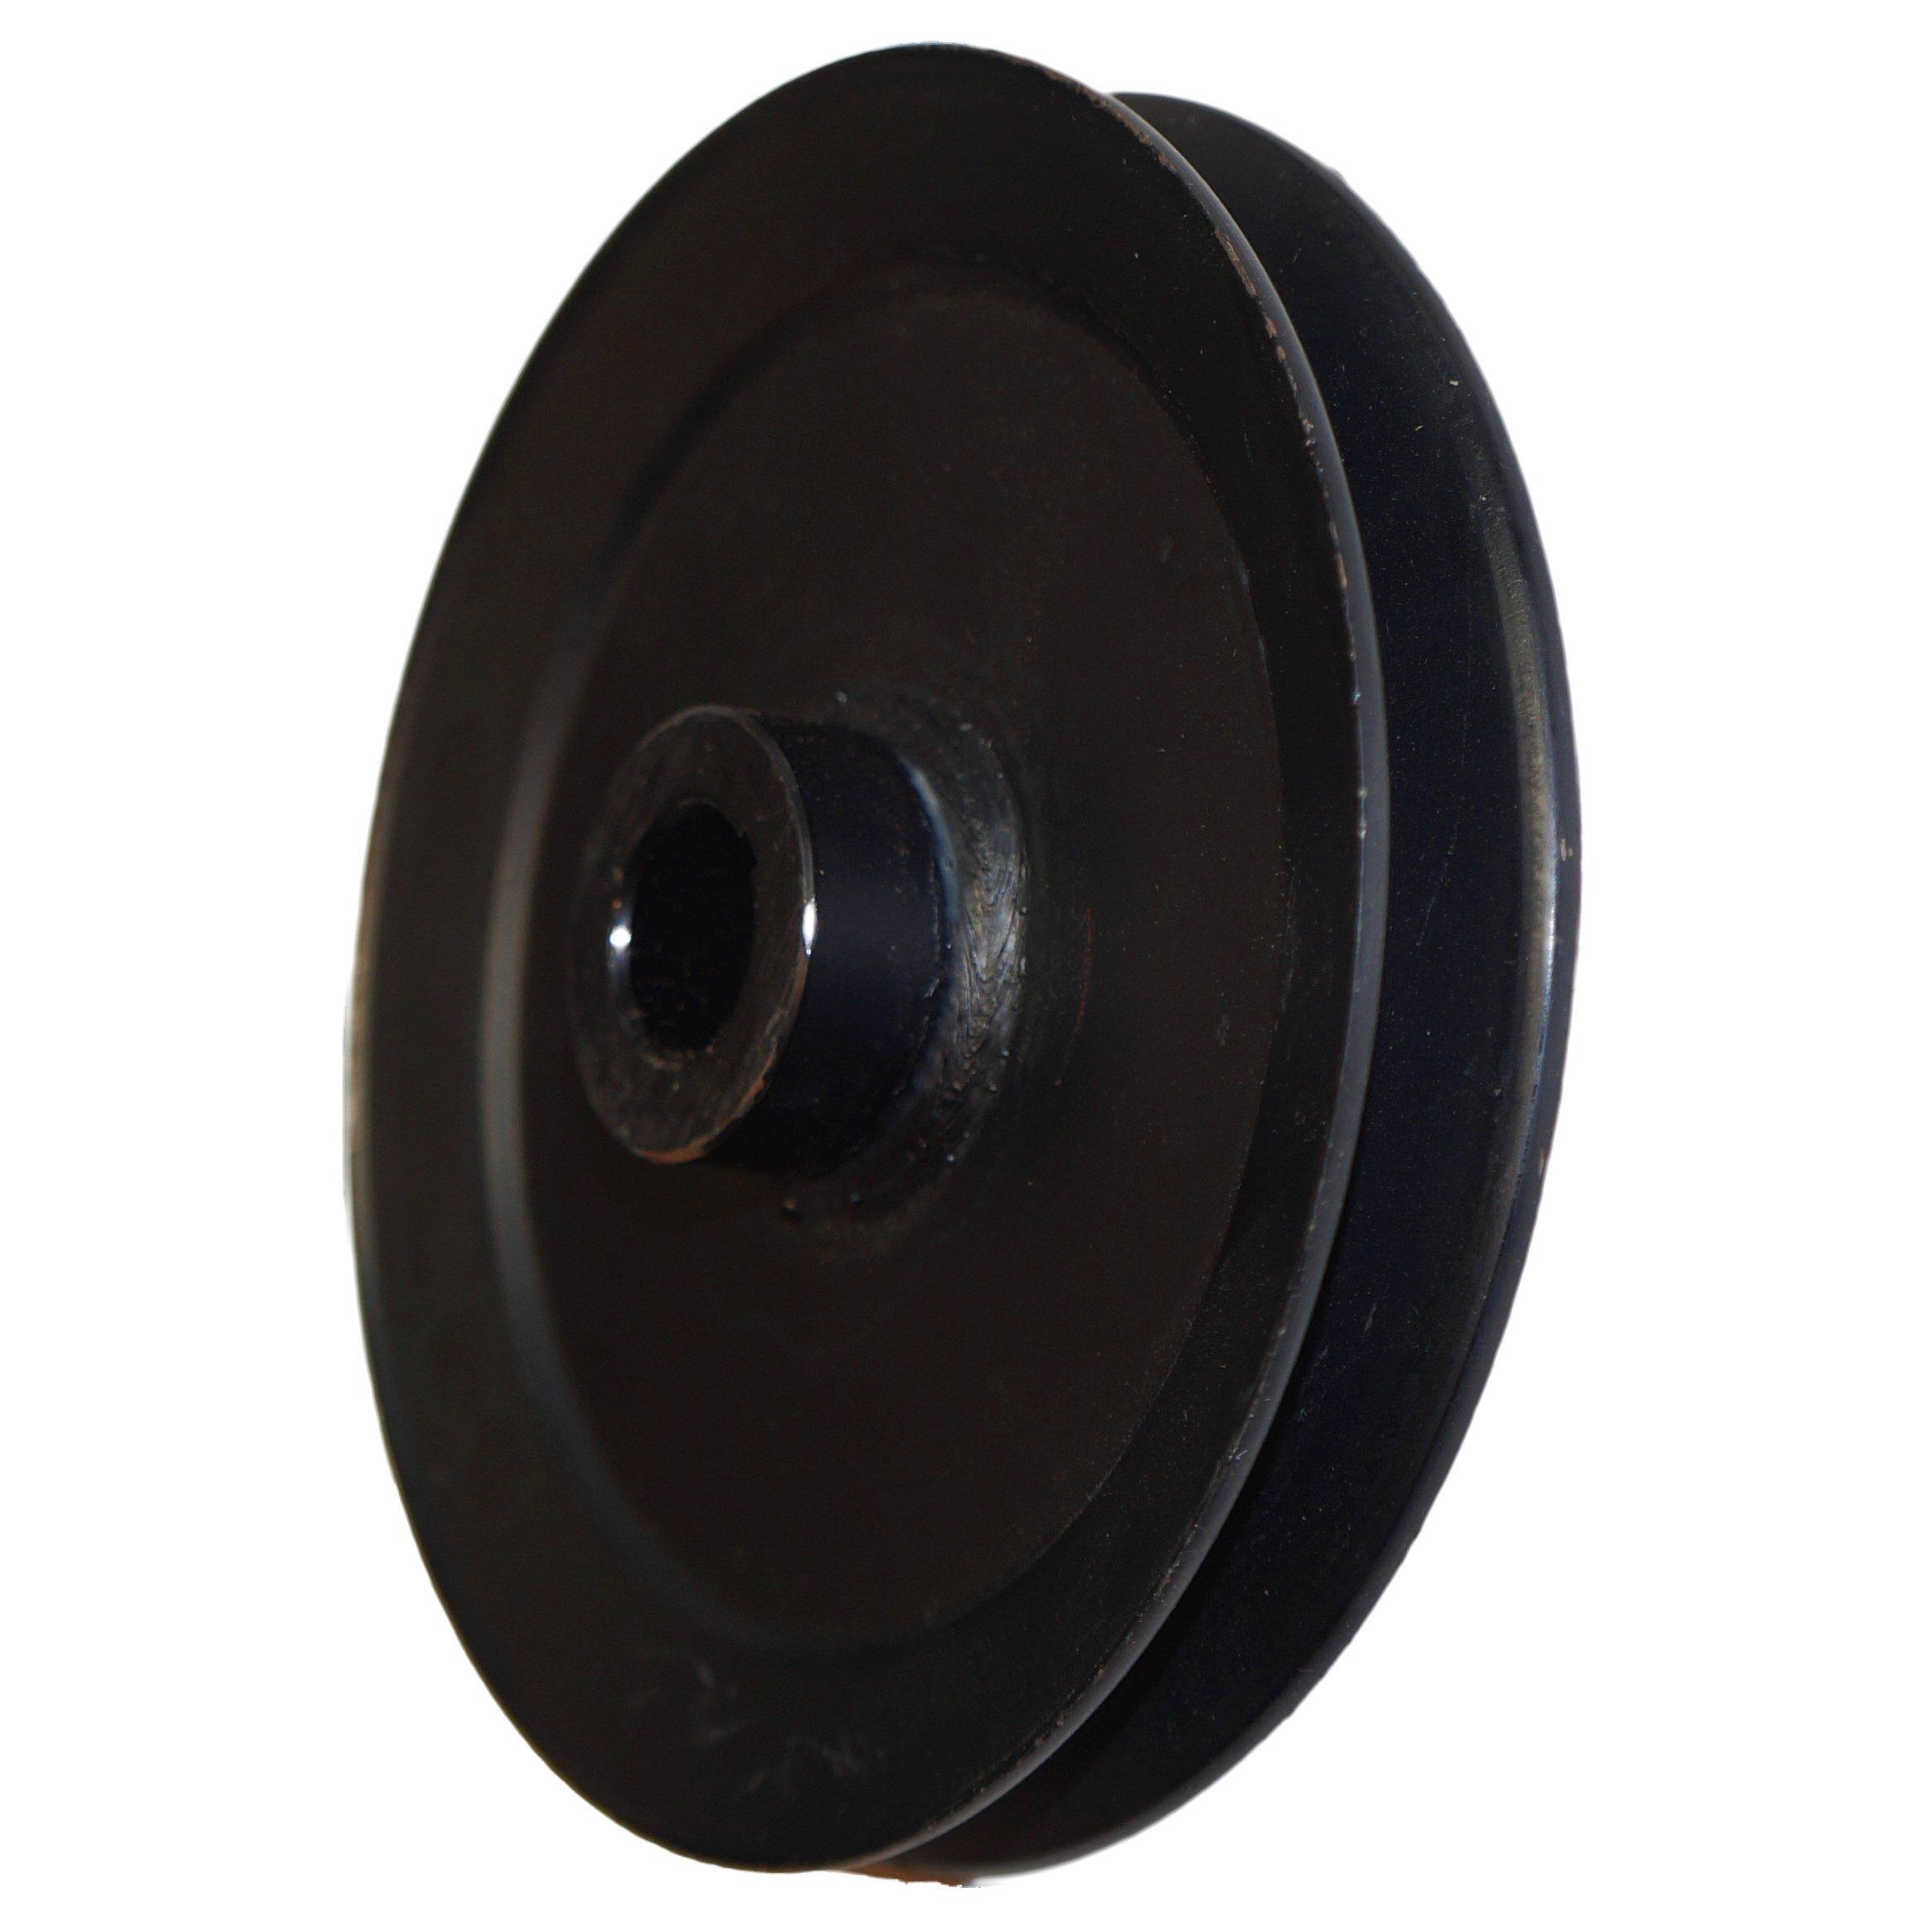 DJS Tractor Parts / Power Steering Pump Pulley - AB-1417D